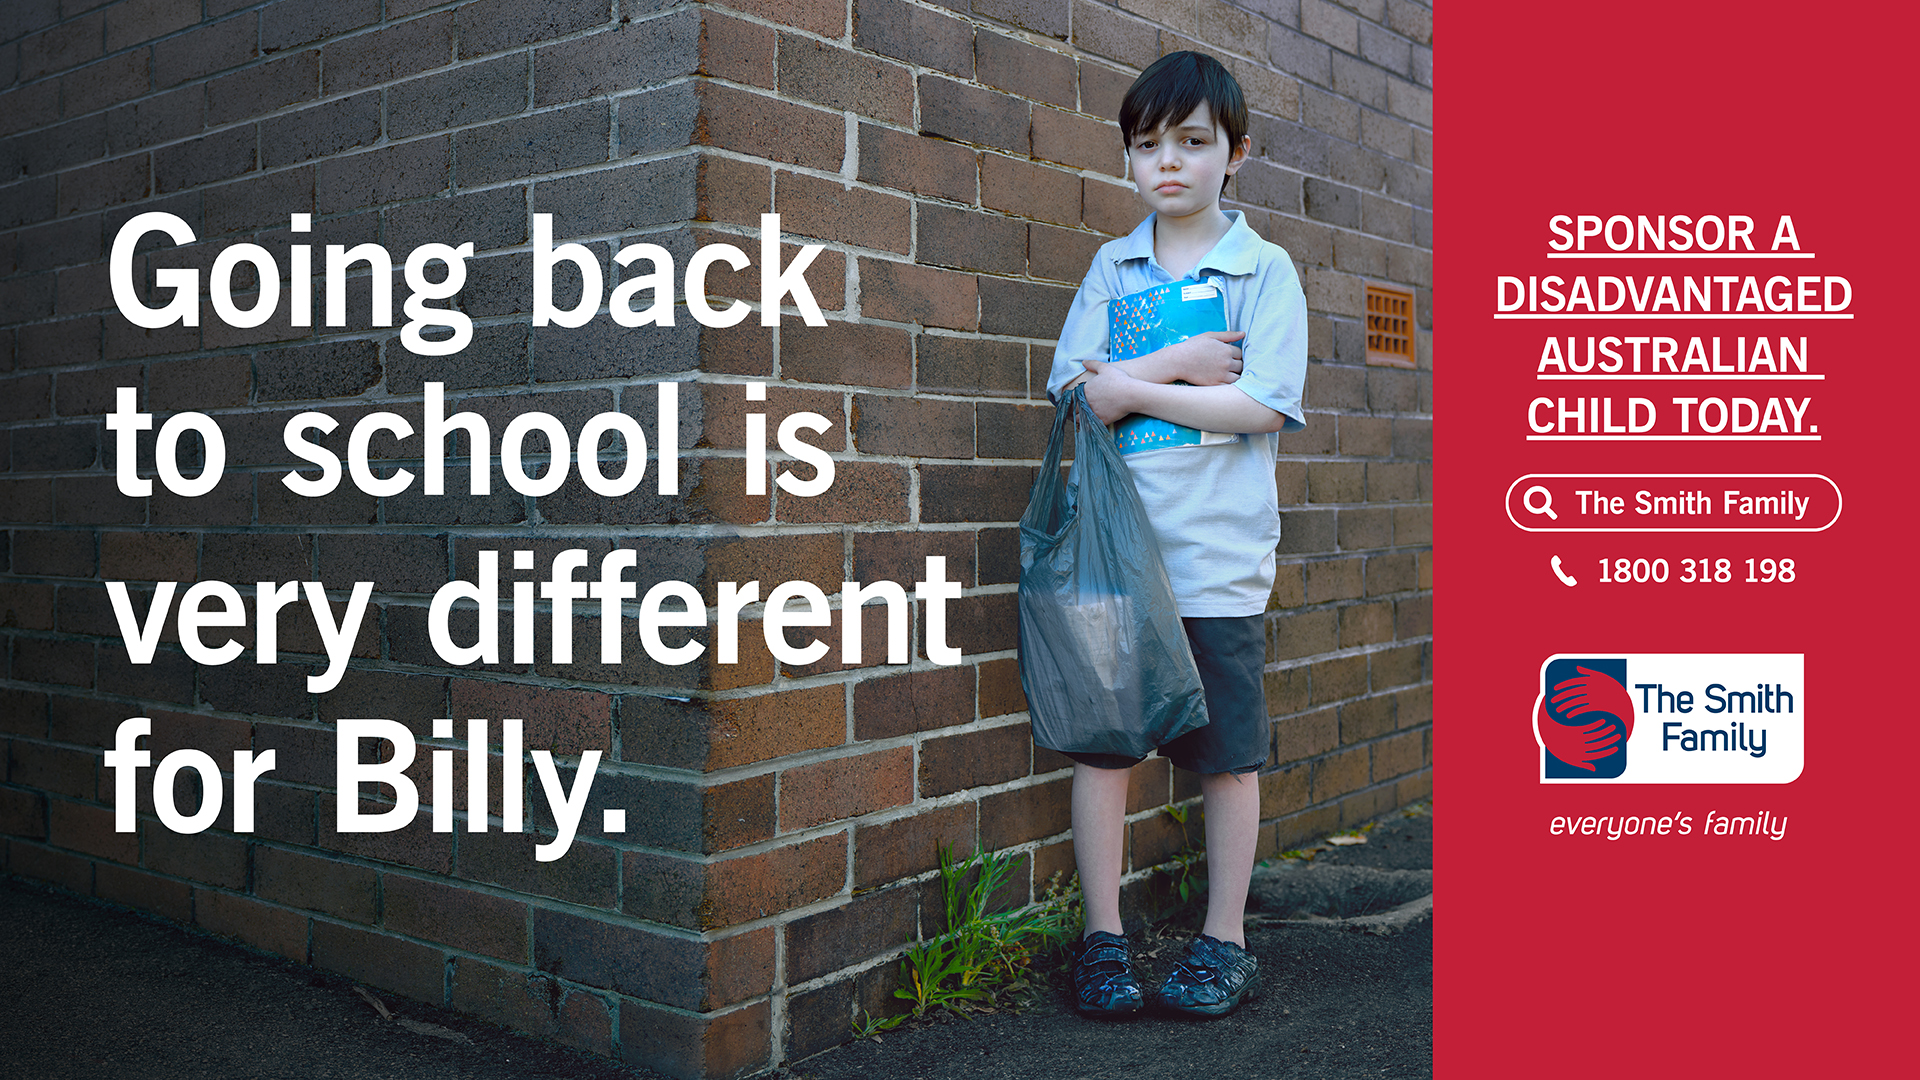 The smith family hero with boy in school uniform looking sad